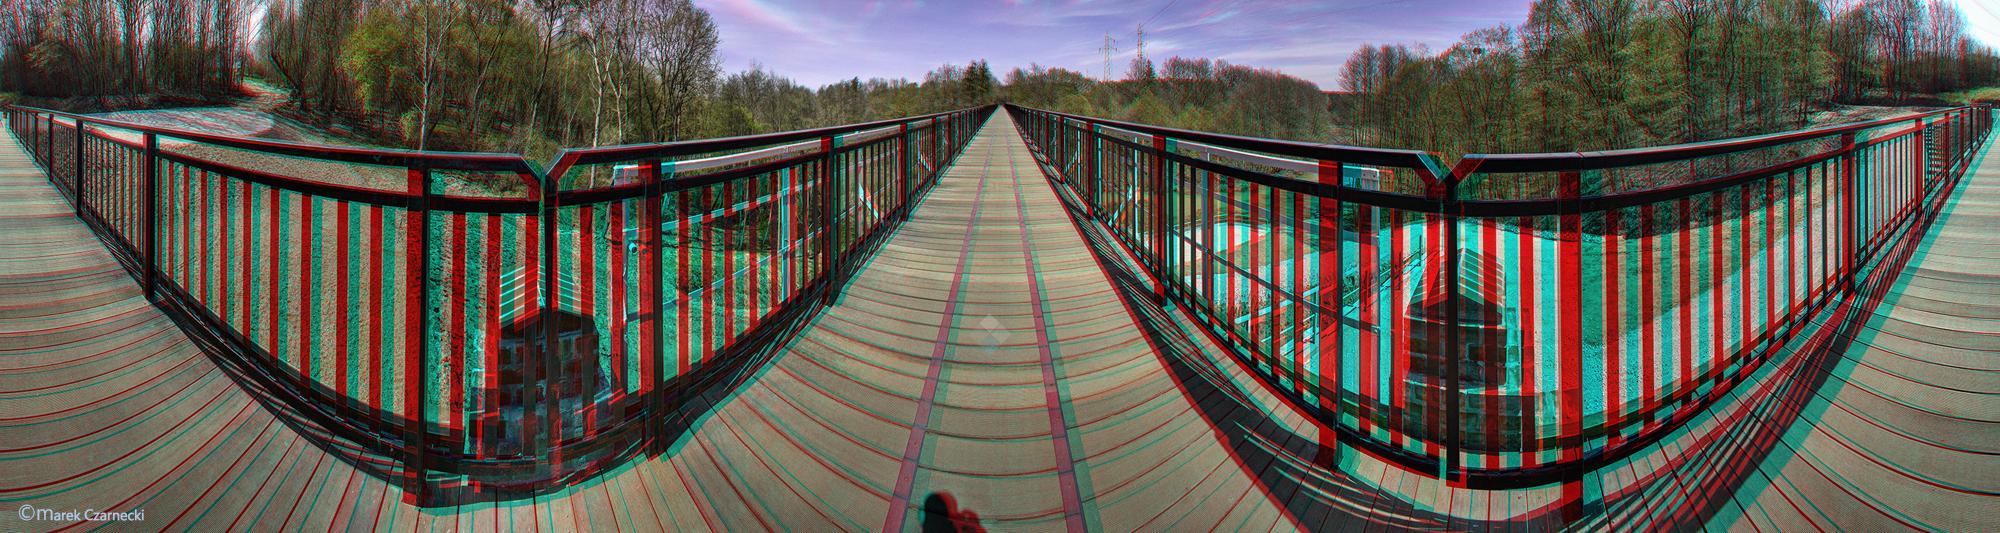 Most Okole